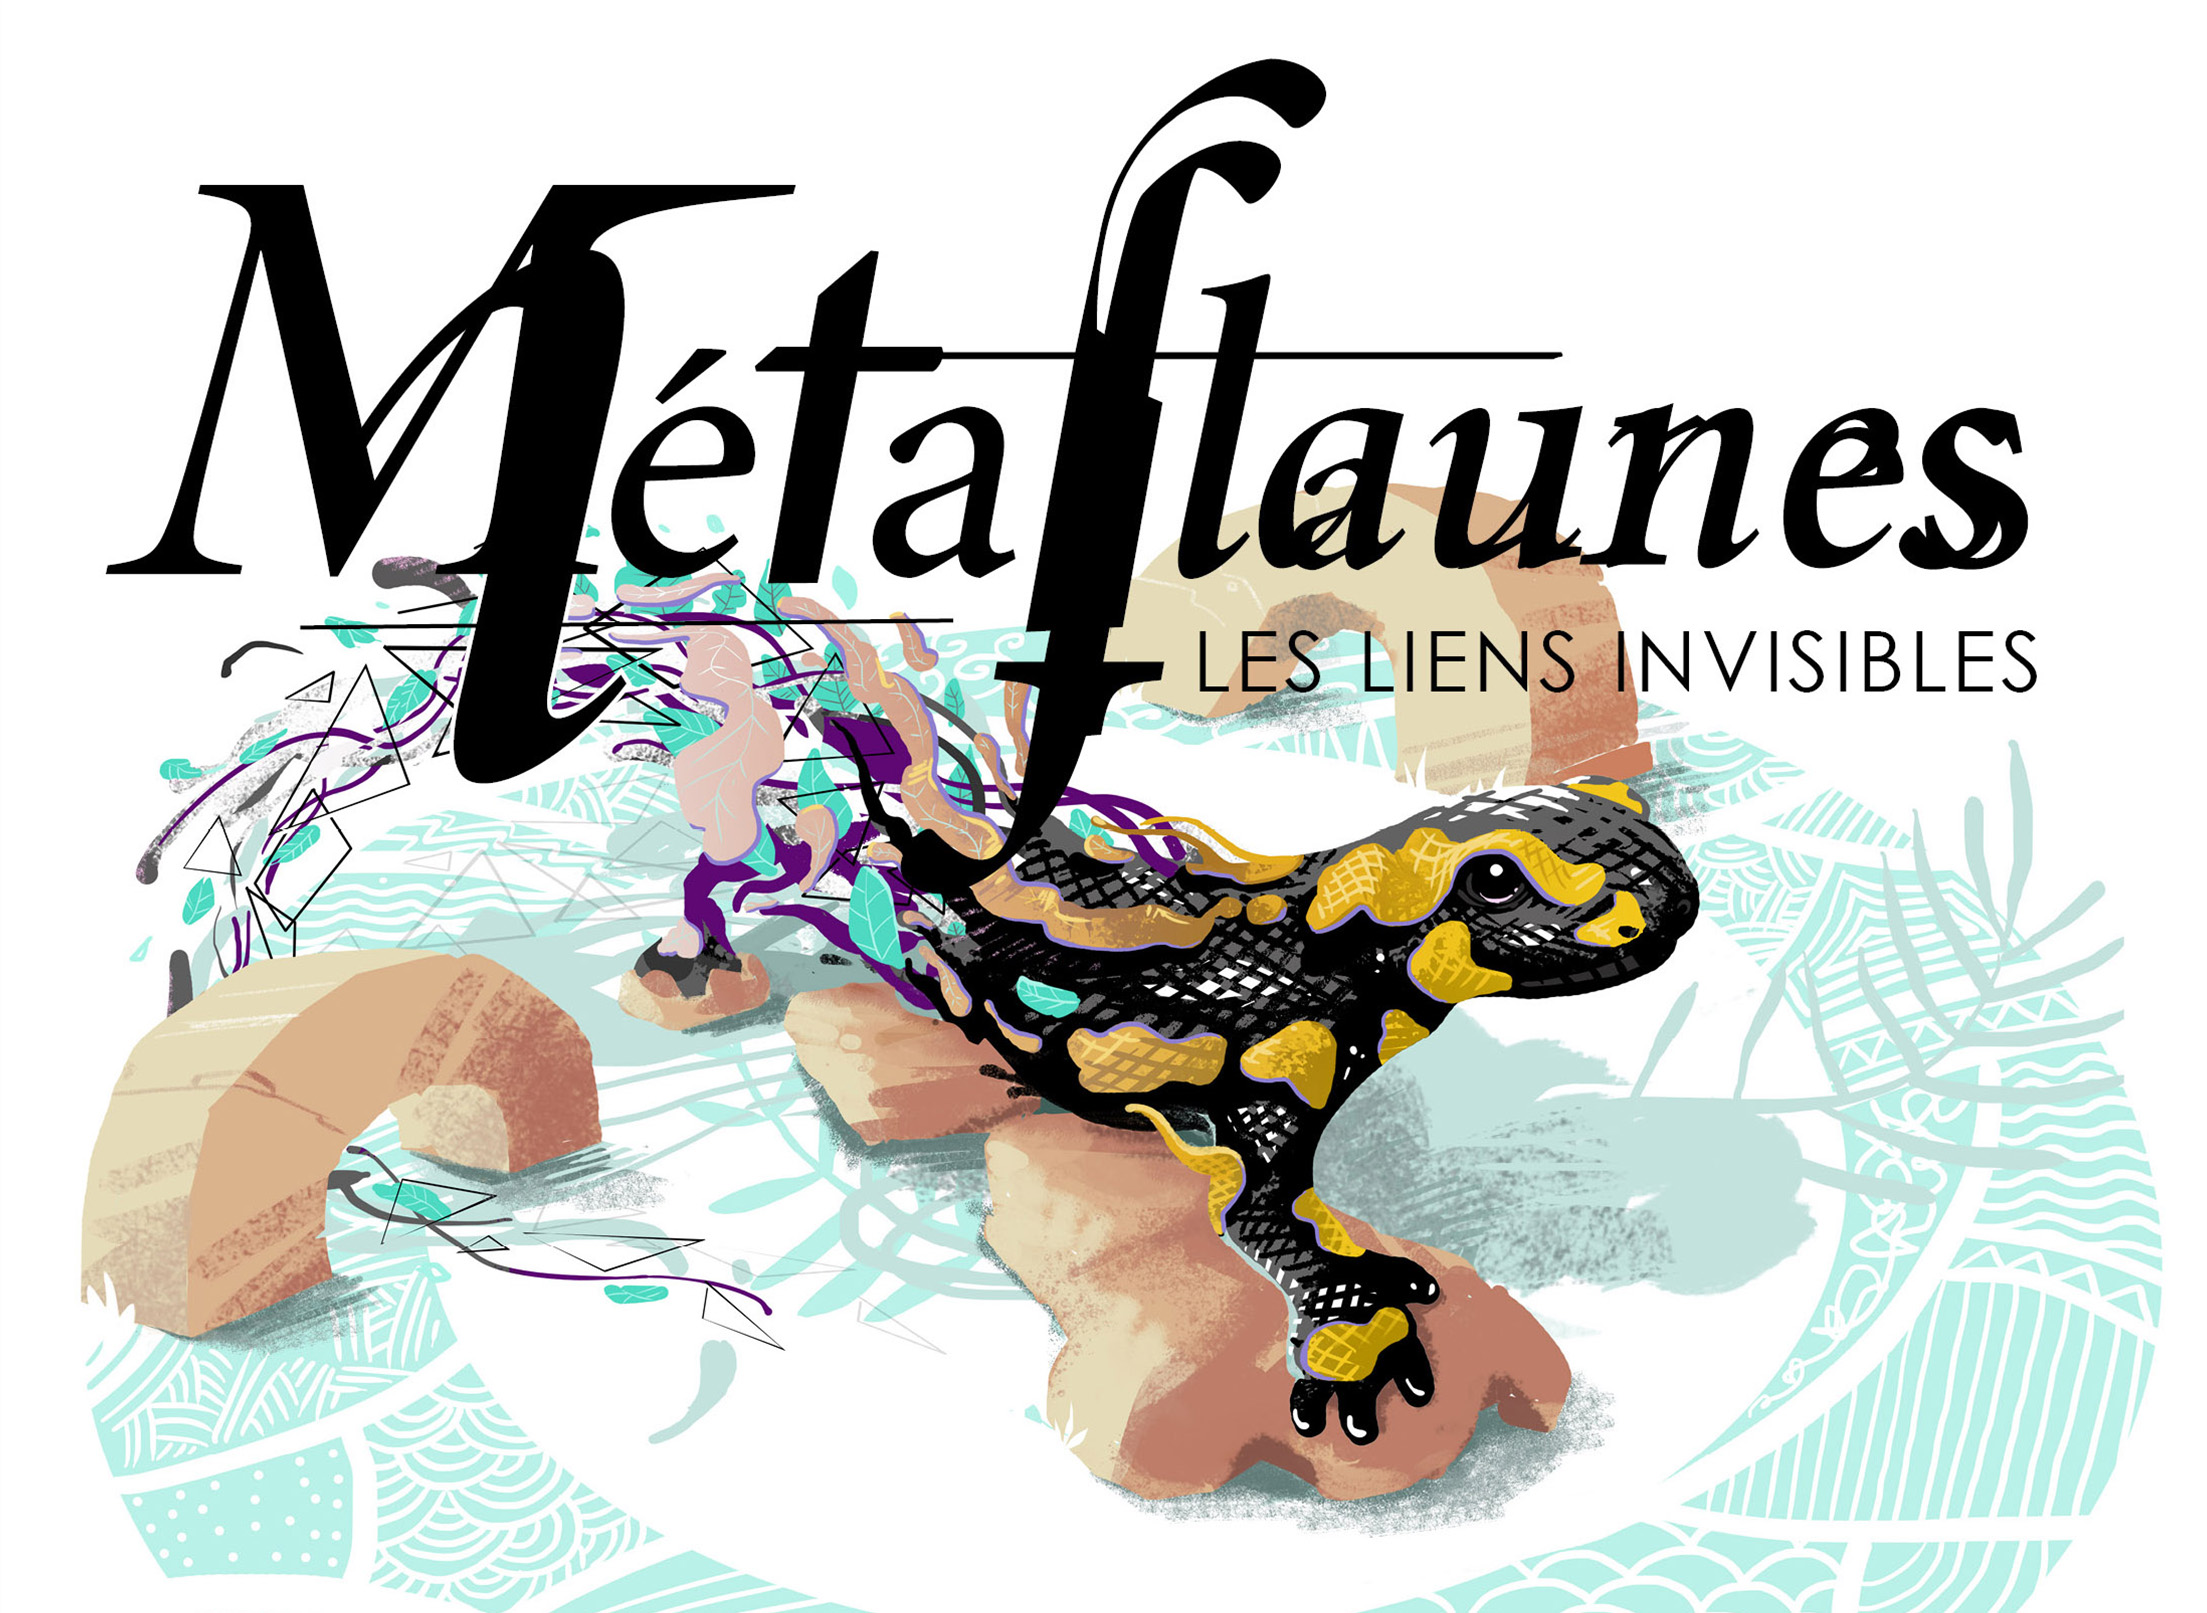 abys-illustration digital - streetart-lyon metaflaunes animals deco